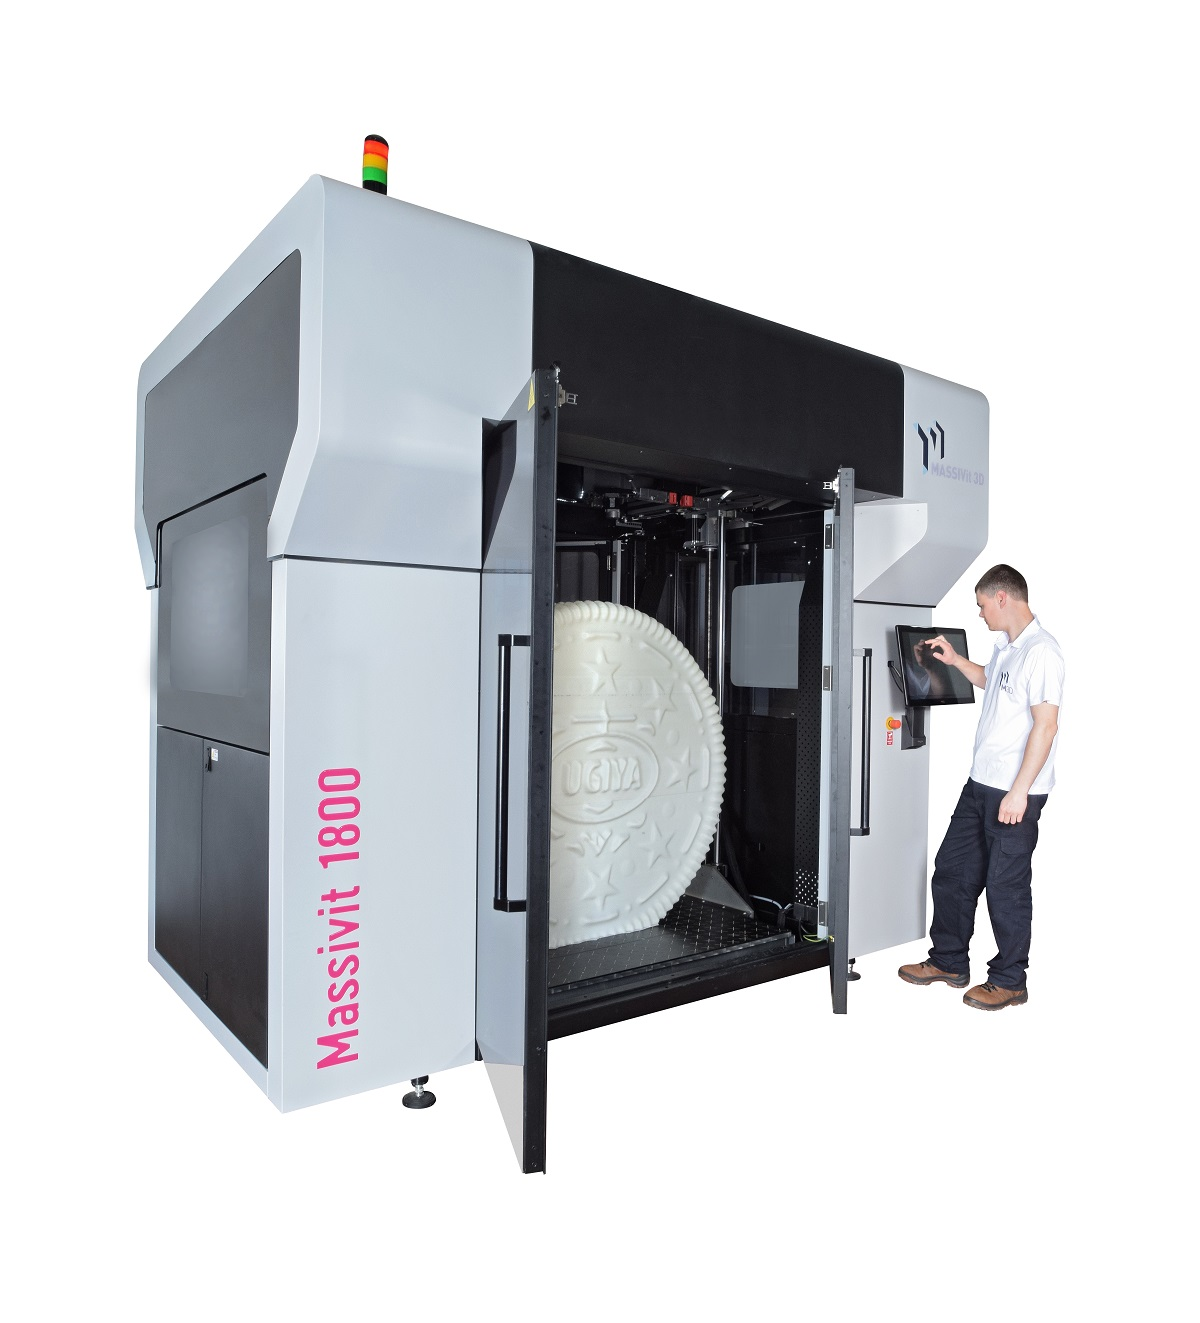 Massivit 1800 with operator and model print